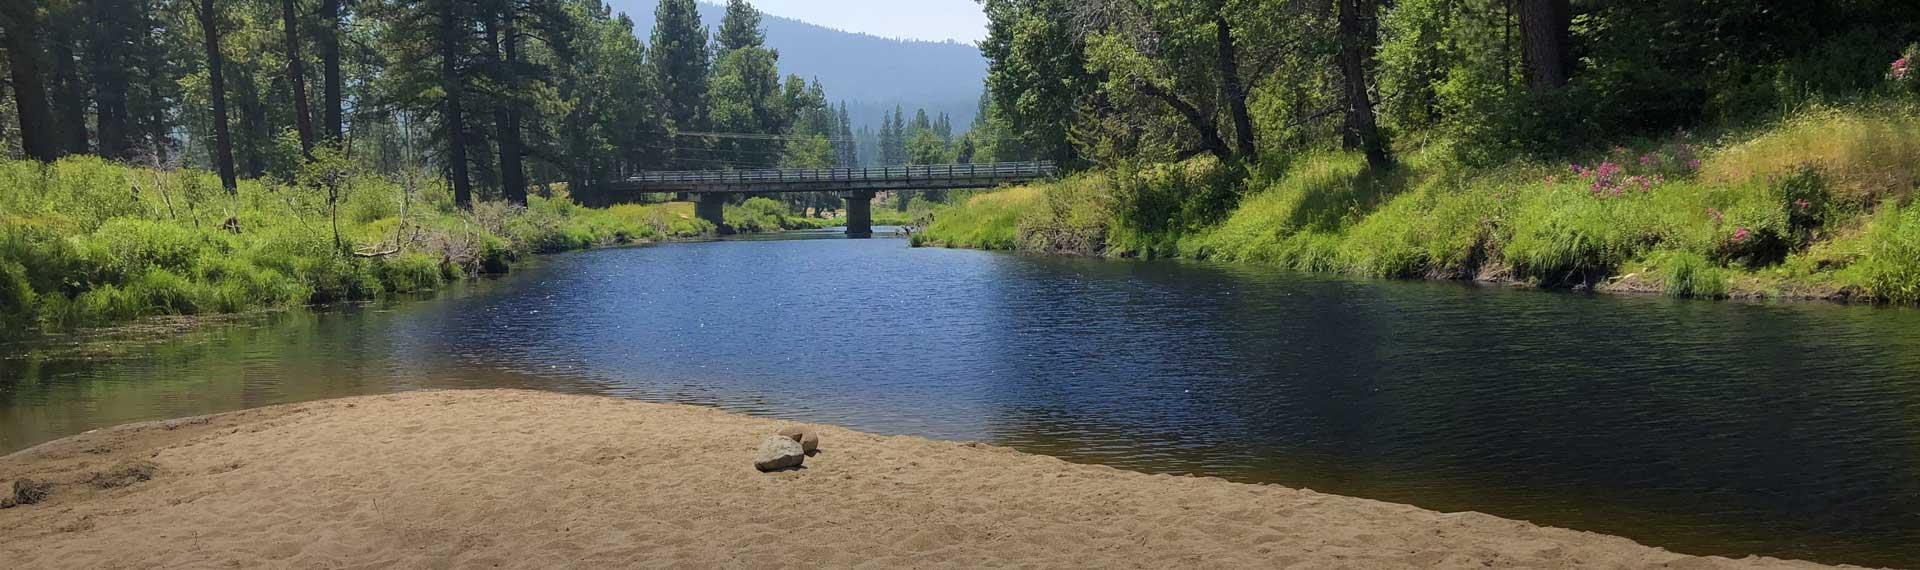 Clios Rivers Edge RV Park | RV Camping, Clio RV Park